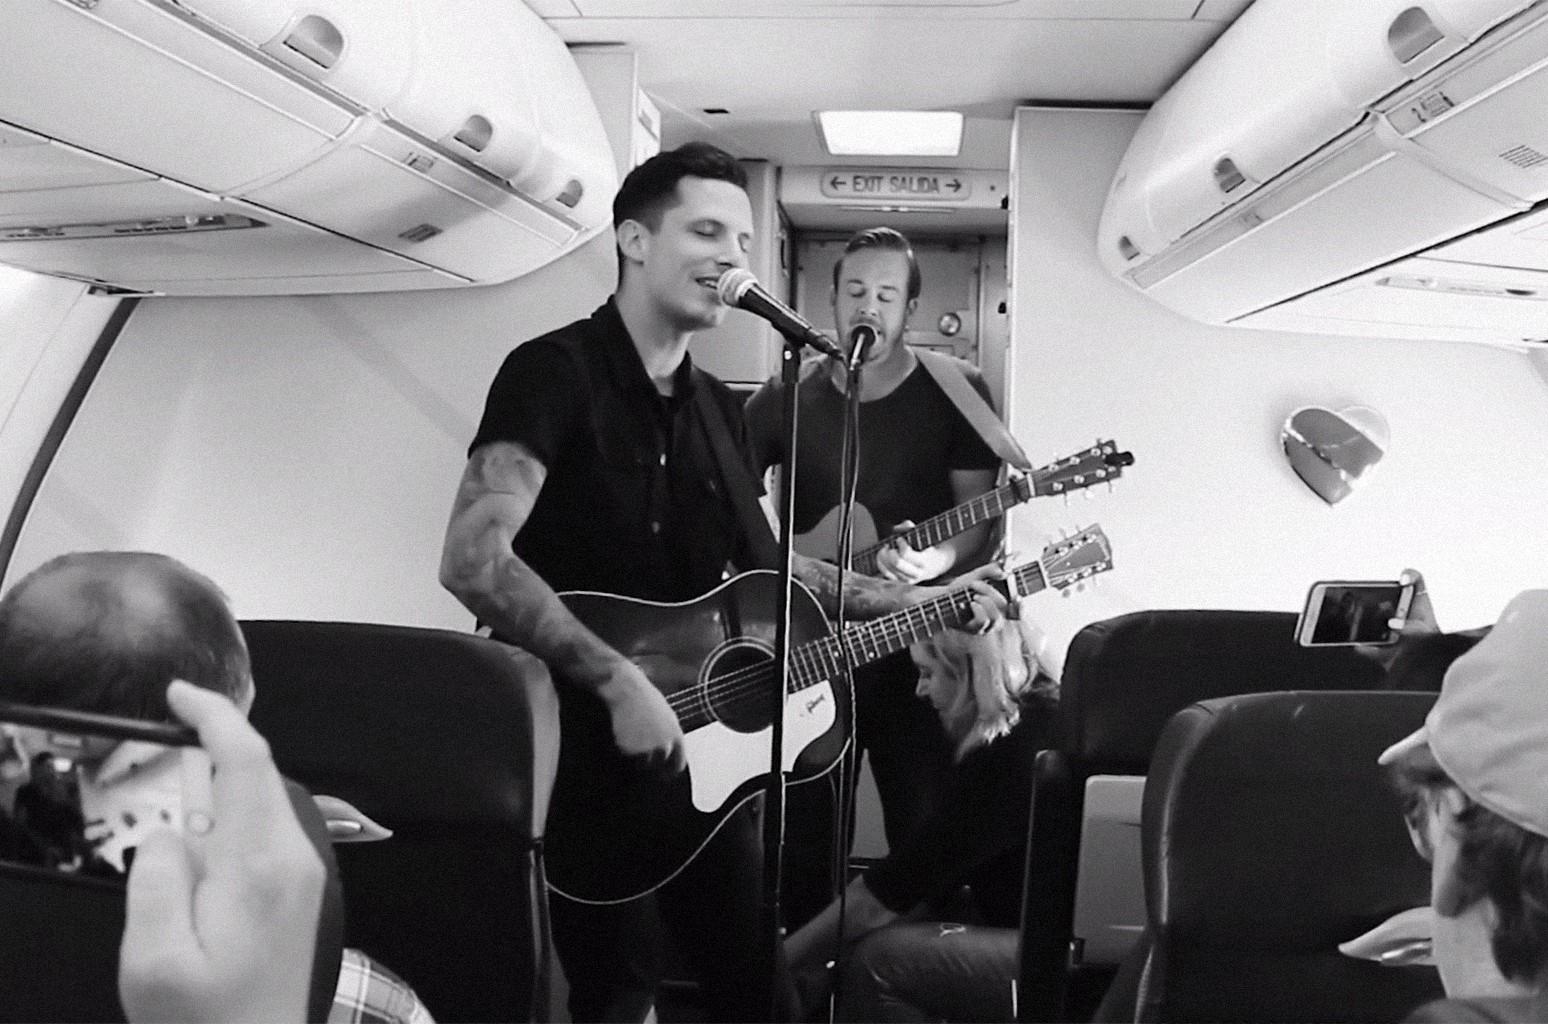 Devin Dawson performs on Southwest Airlines flight.